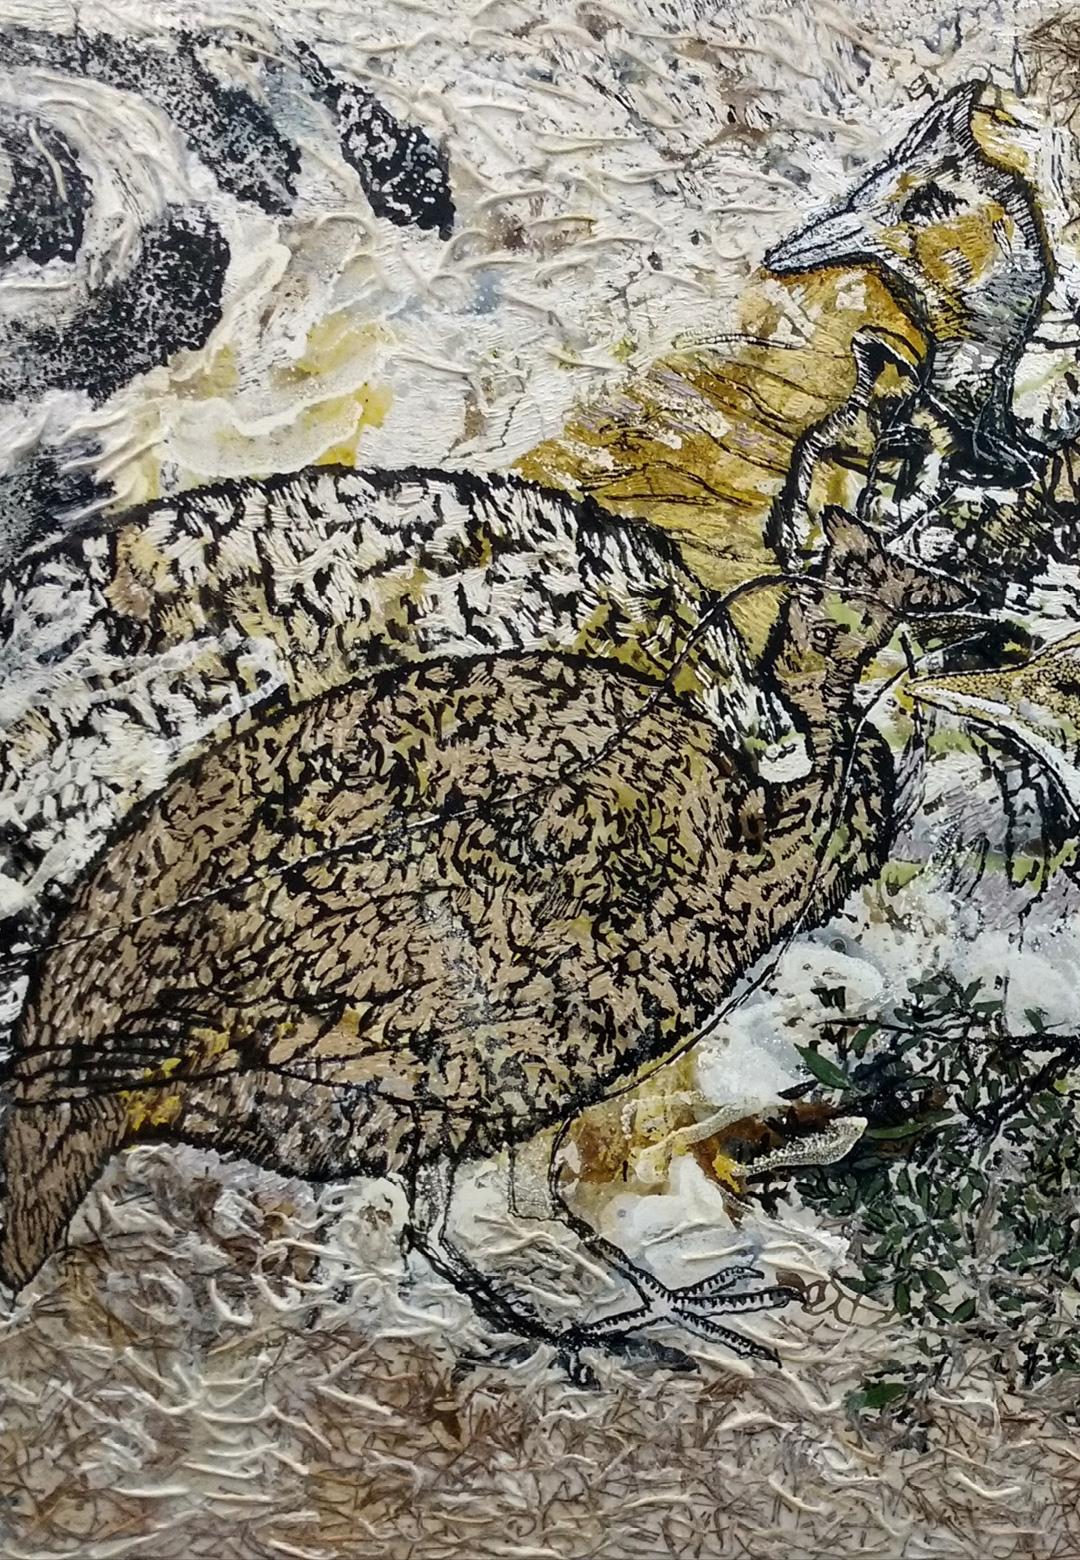 Jayashree Chakravarty; Oil, acrylic jute, leaf cotton paper on canvas, 2018| Akar Prakar| STIR